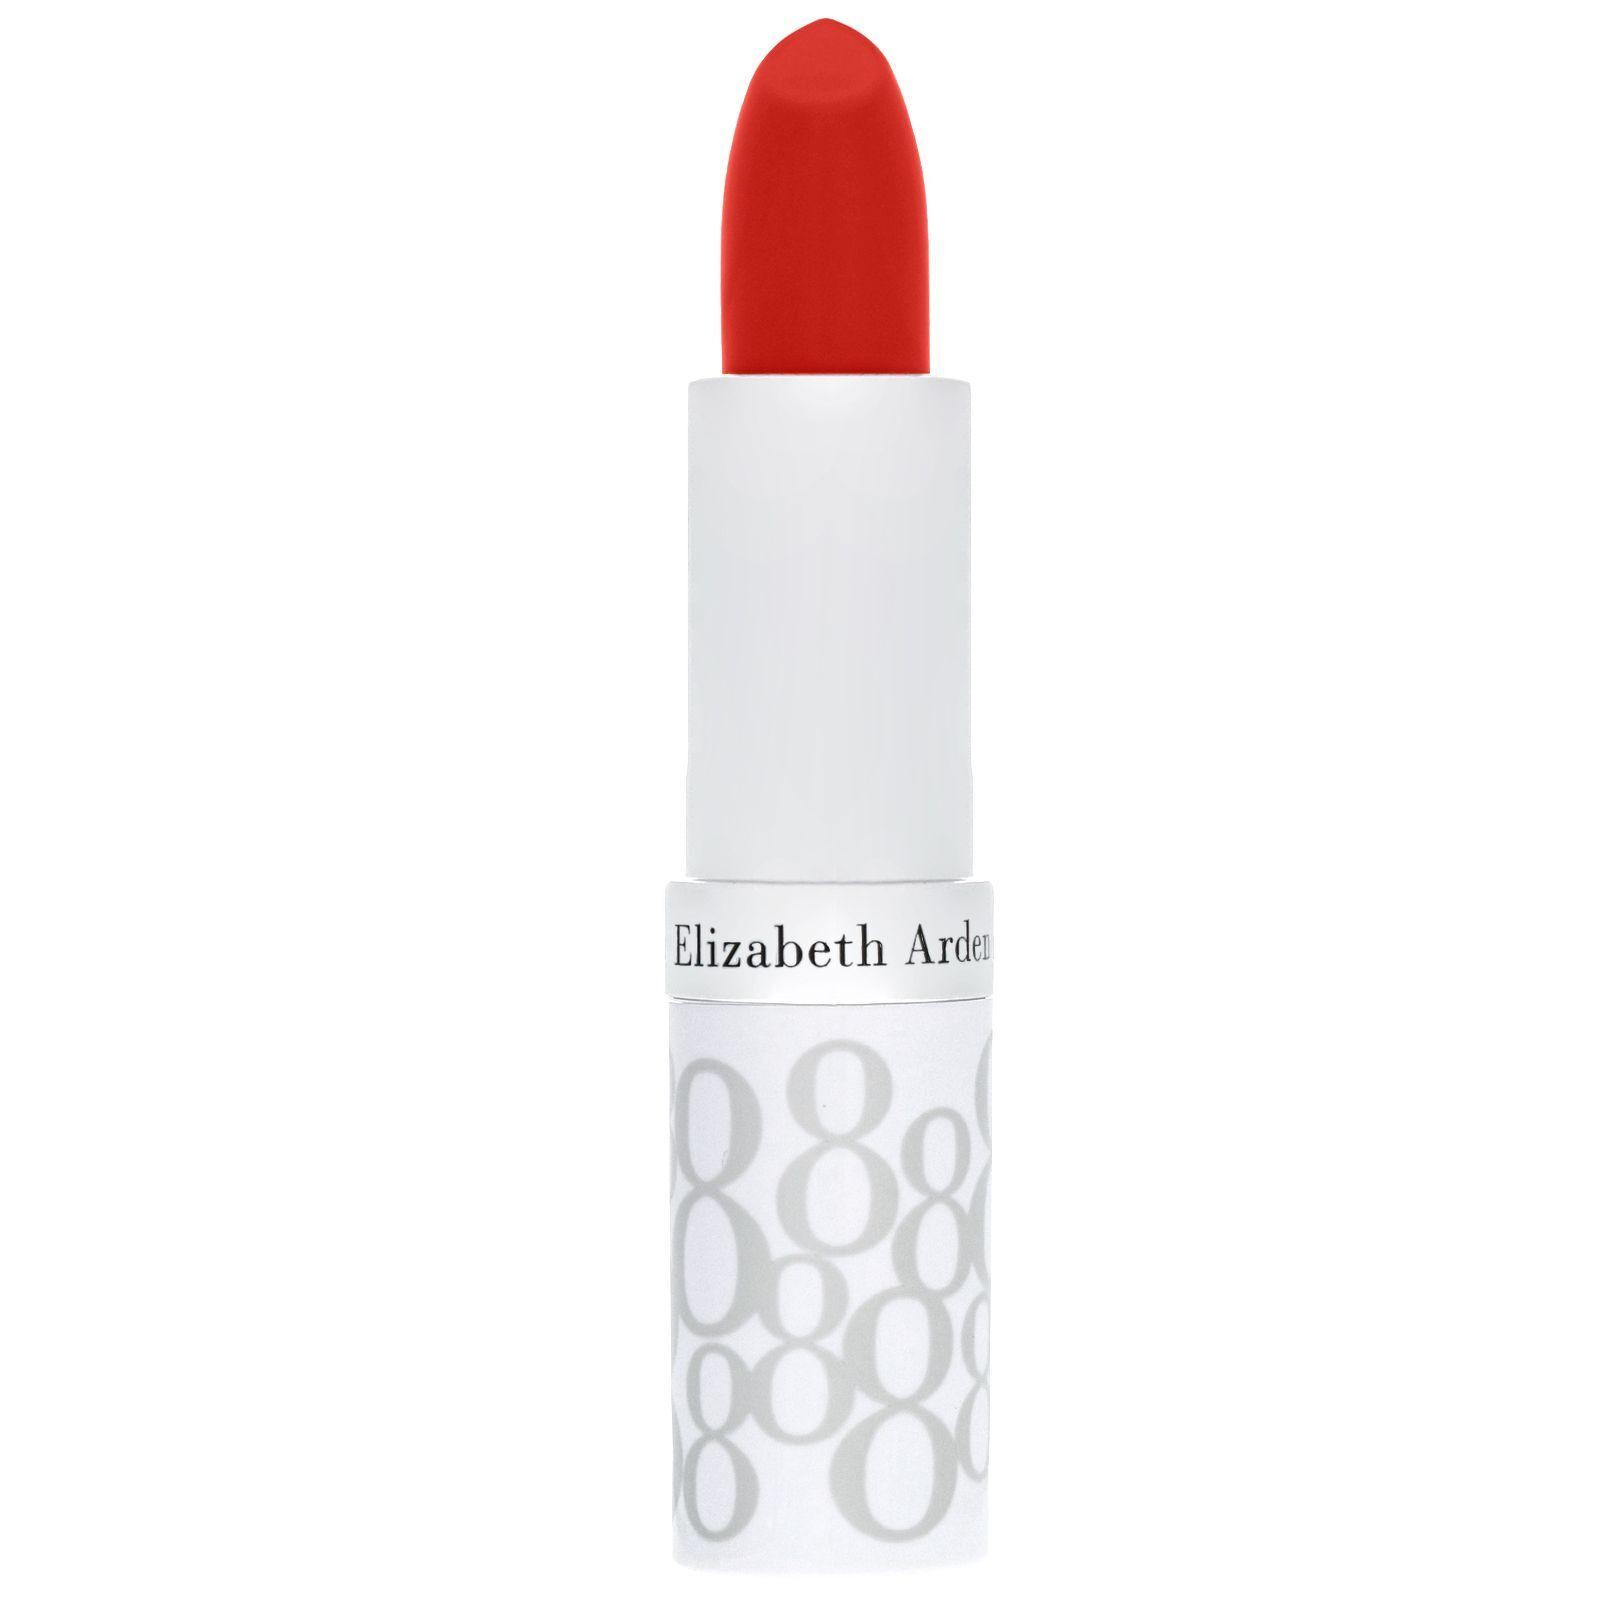 Elisabeth Arden - Eight Hour Lip Protectant Stick SPF15 05 Berry 3.7g / 0.13 oz.  for Women